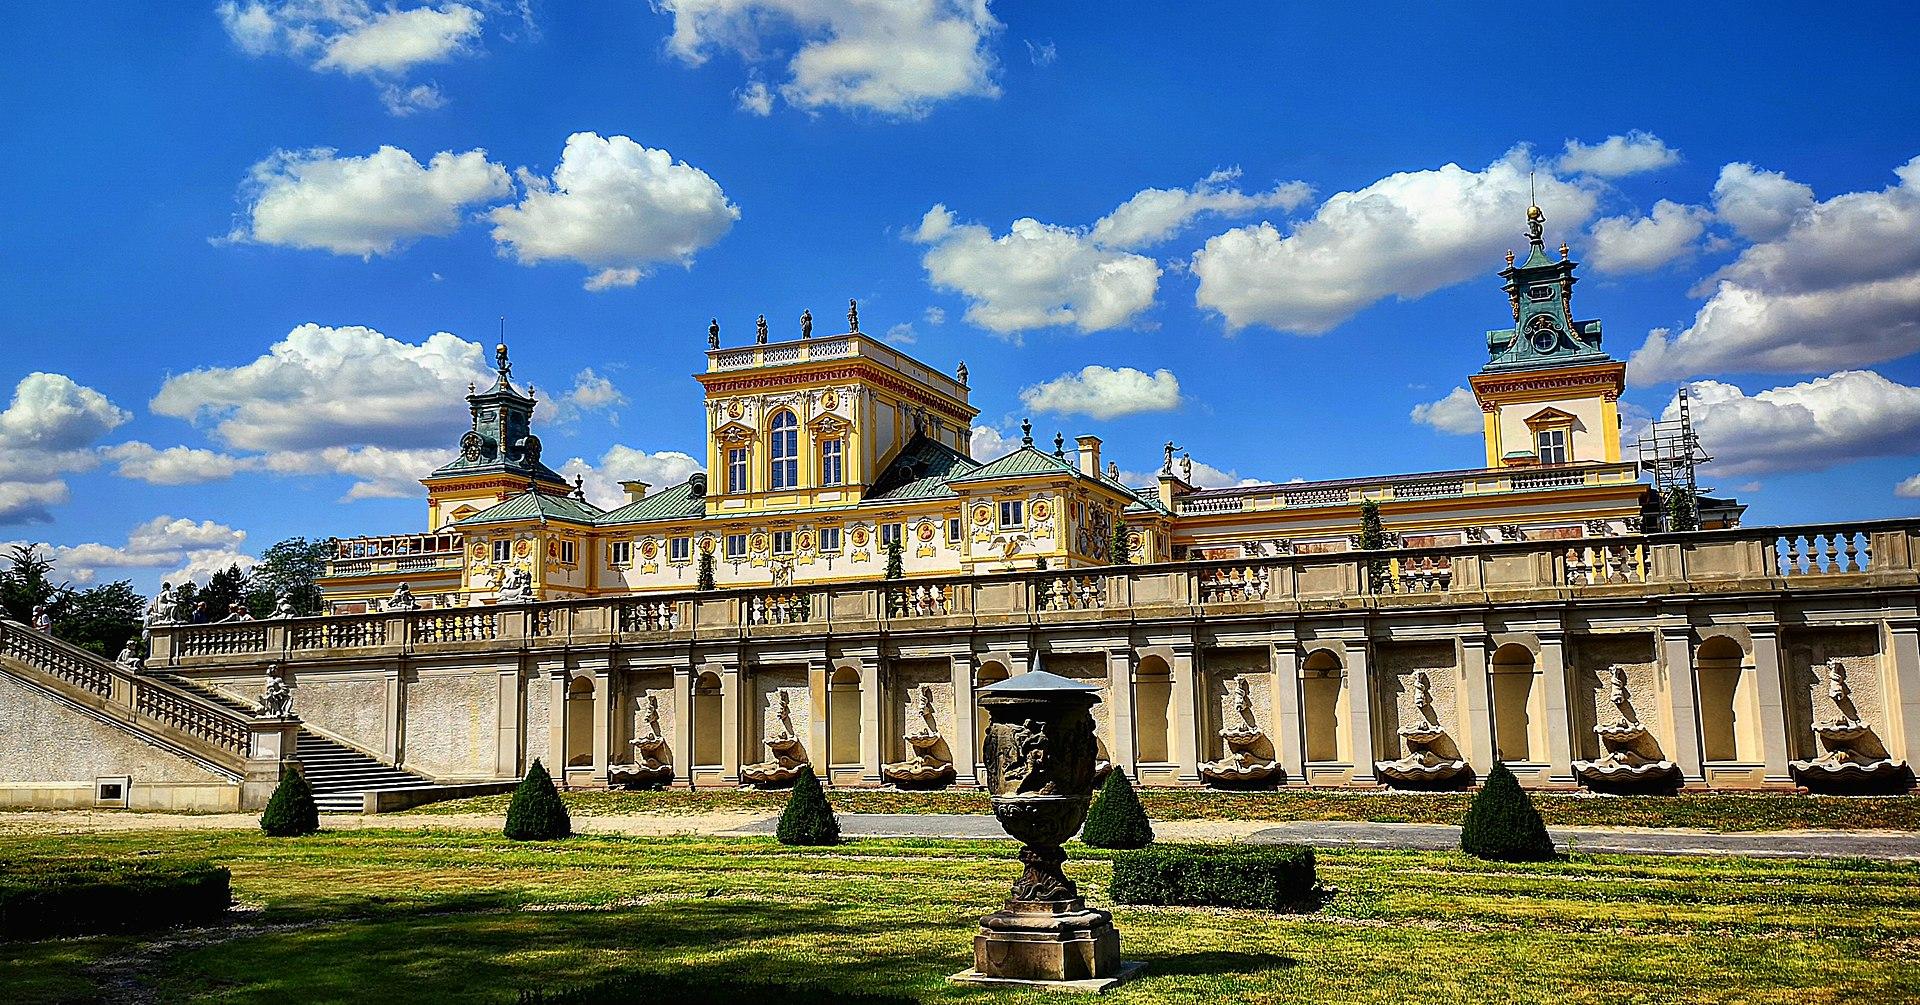 Wilanów Palace in Warsaw2.jpg